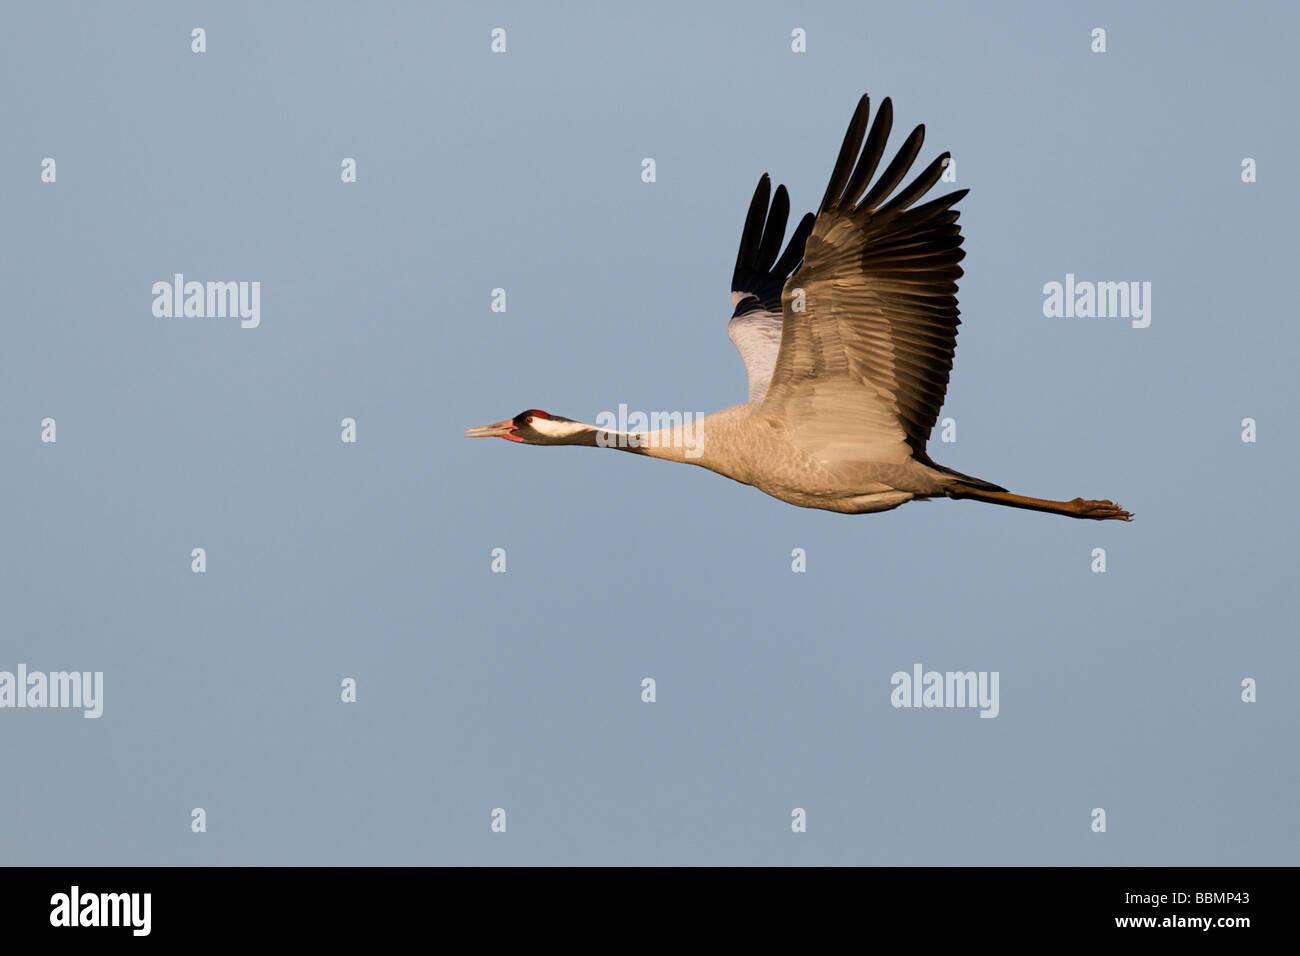 Common Cranes (Grus grus) in flight, Lake Hornborga, Vaestergoetland, Sweden, Scandinavia, Europe Stock Photo